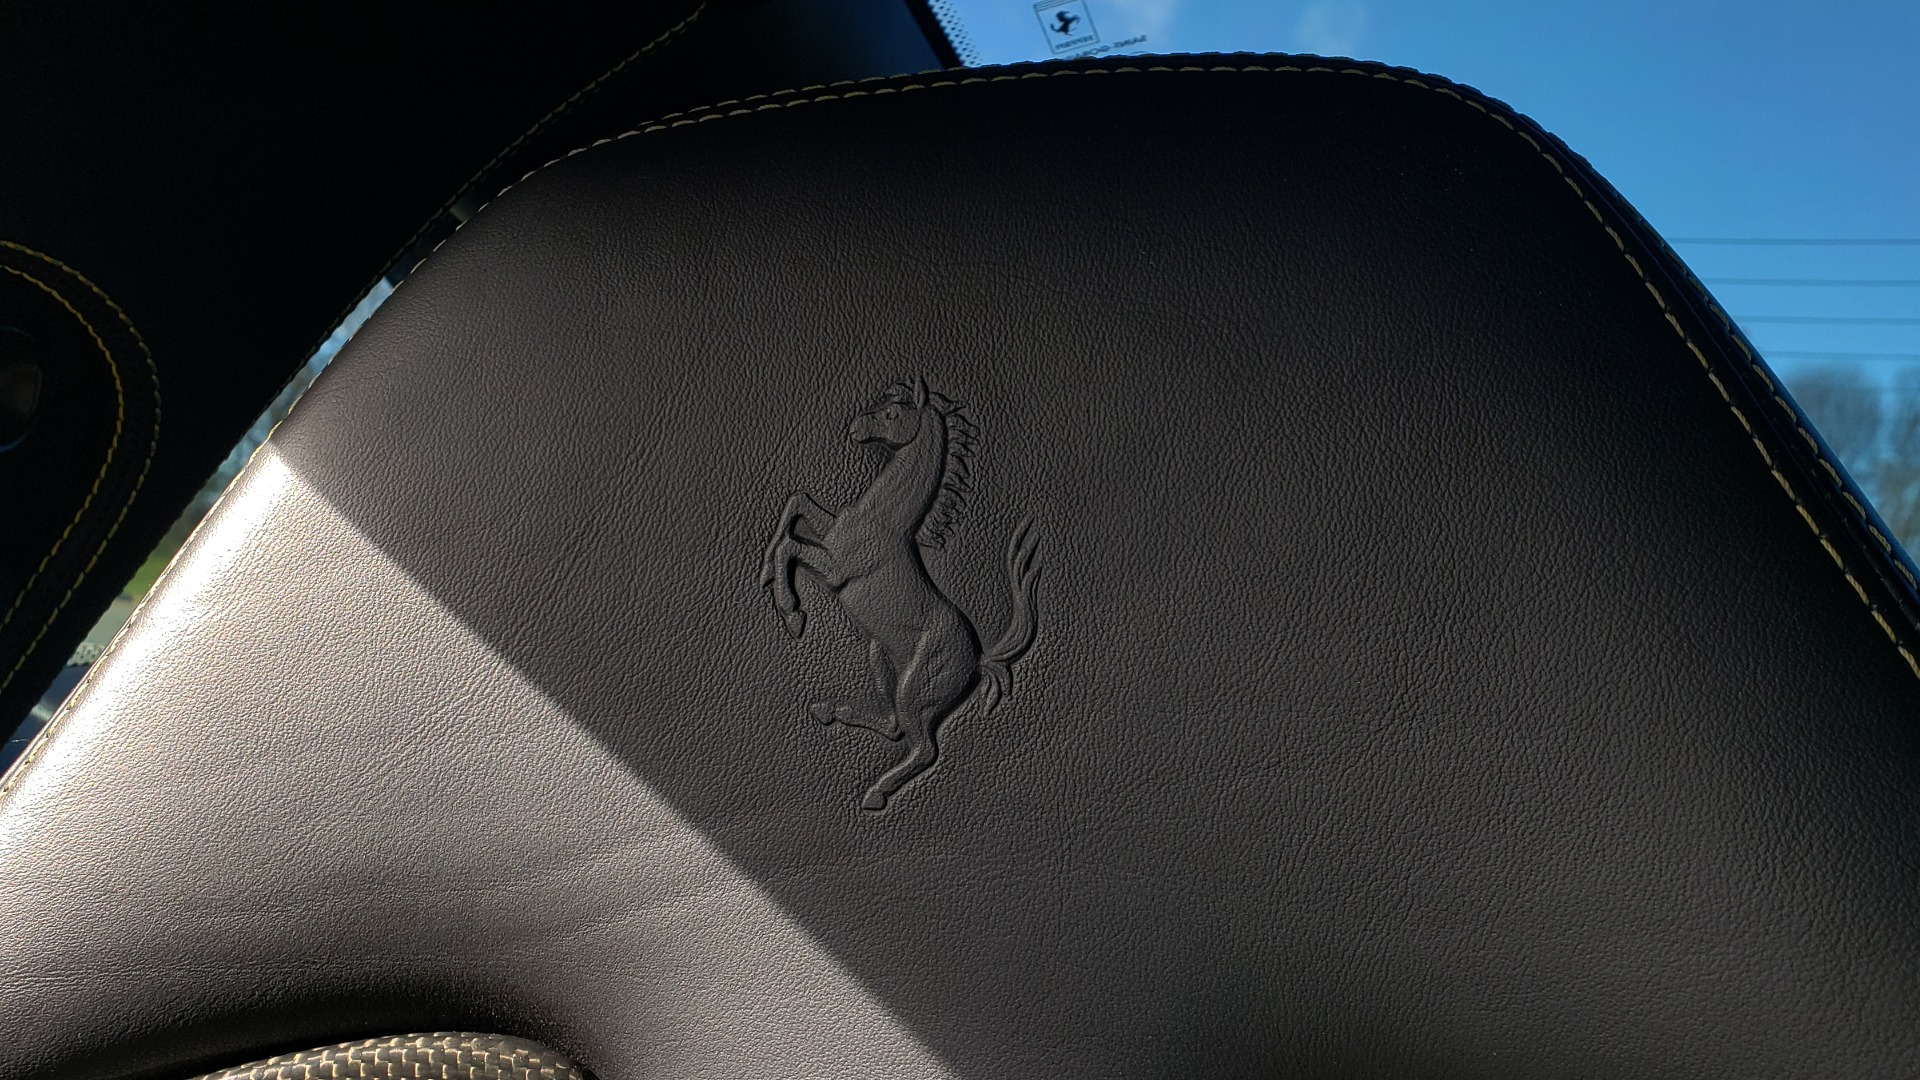 Used 2007 Ferrari 599 GTB FIORANO HGTE / V12 / F1 TRANS / NAV / BOSE / CUSTOM WHEELS for sale $109,999 at Formula Imports in Charlotte NC 28227 113